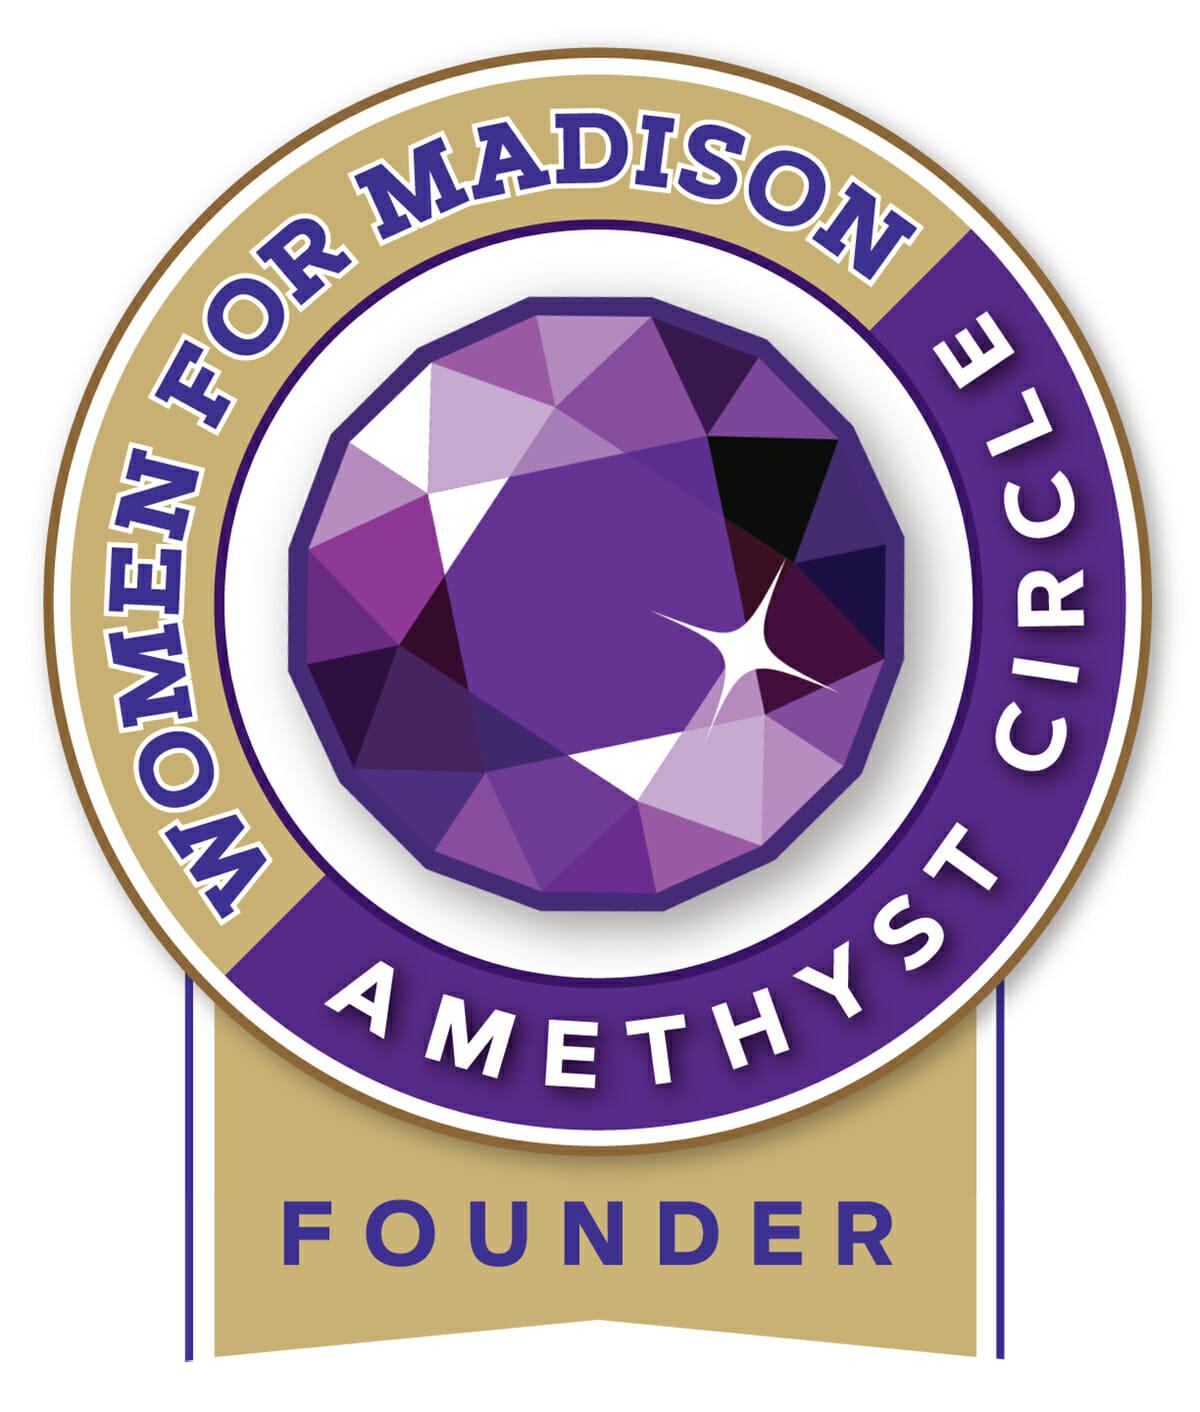 Women for Madison Amethyst Circle Founder logo